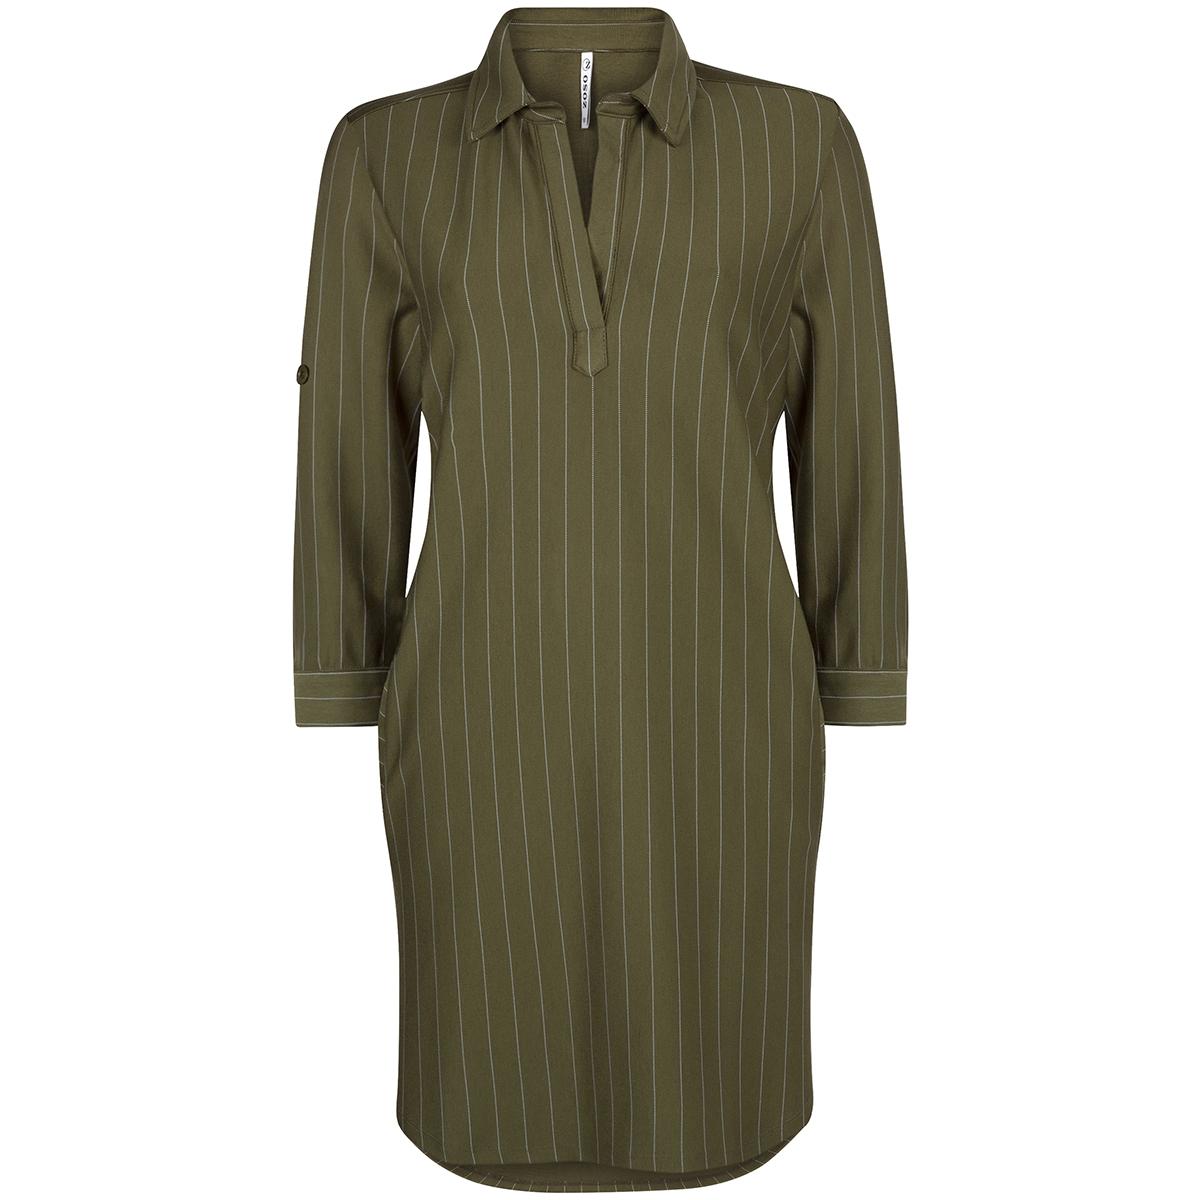 pinstripe tunic hr1925 zoso jurk army/offwhite